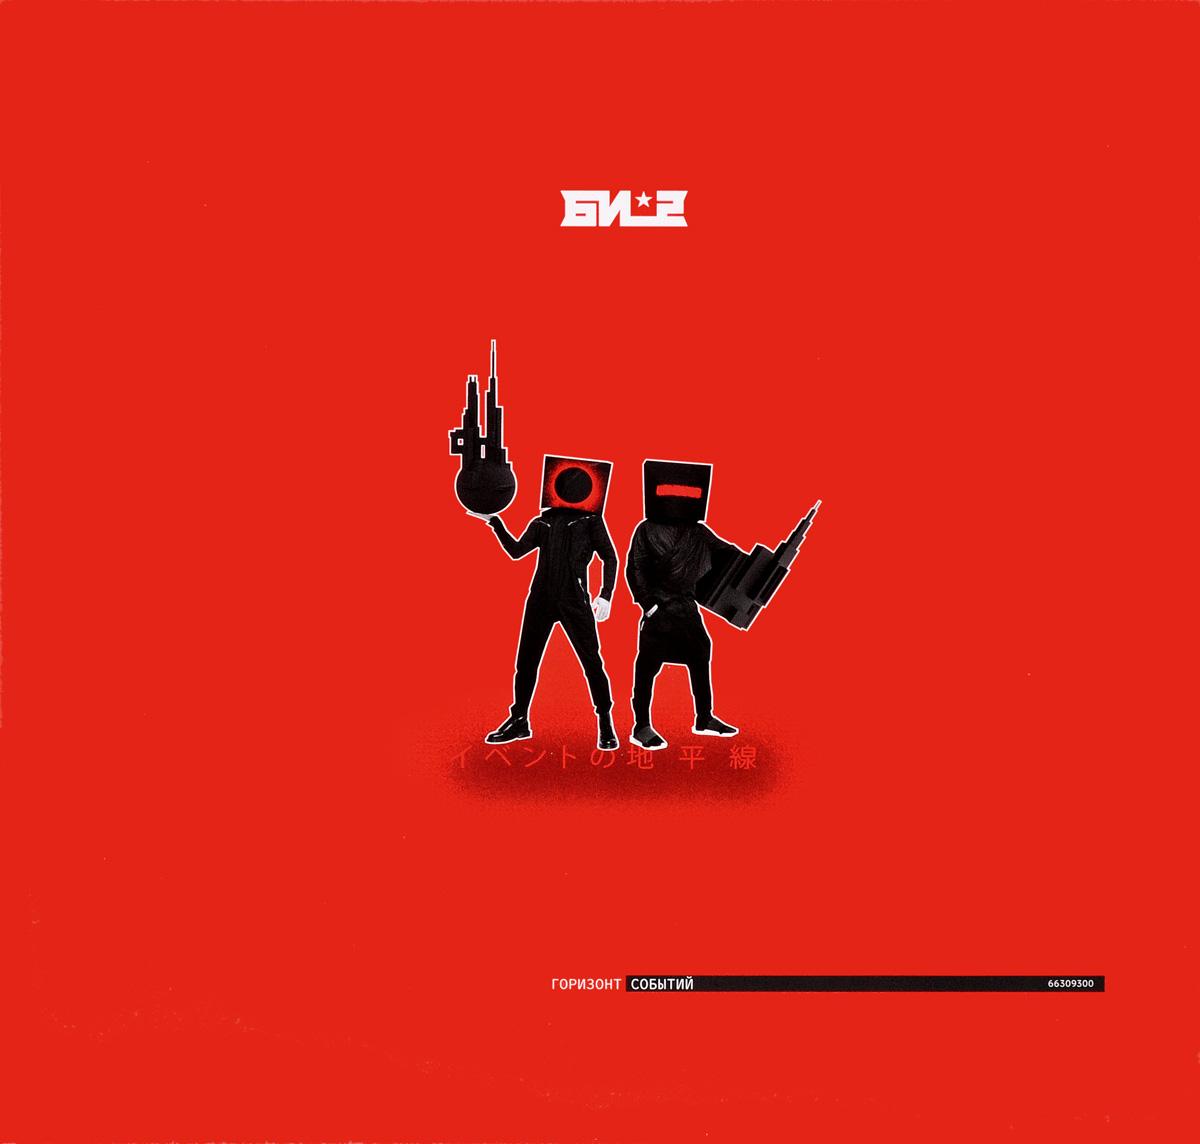 Би-2 Би-2. Горизонт событий (2 LP) би 2 би 2 горизонт событий 2 cd